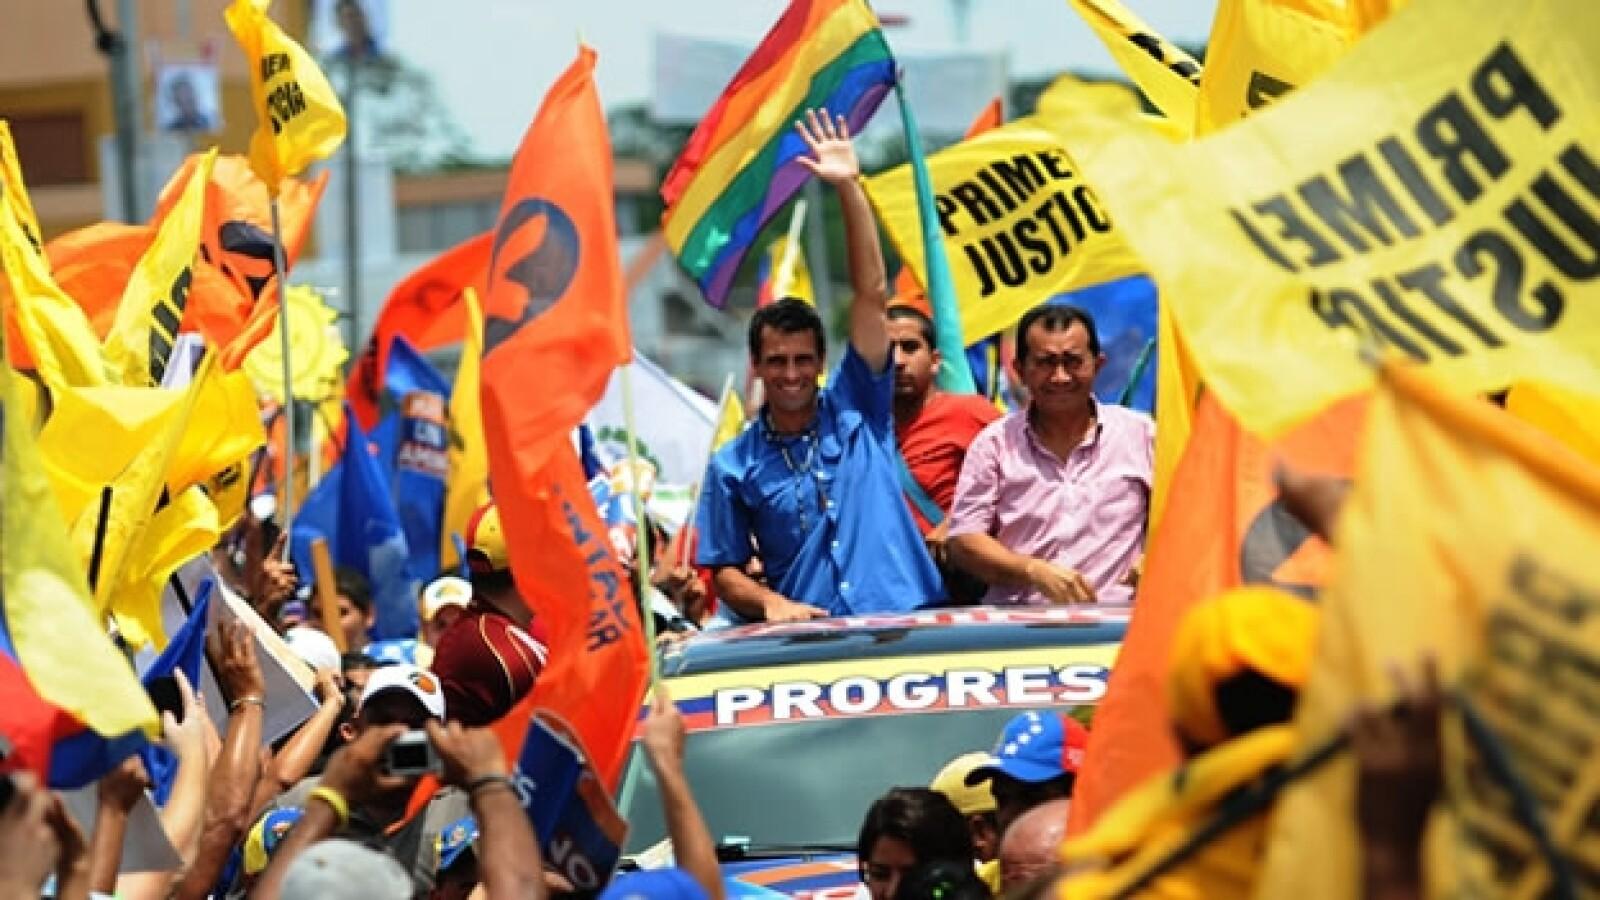 capriles_uno_venezuela